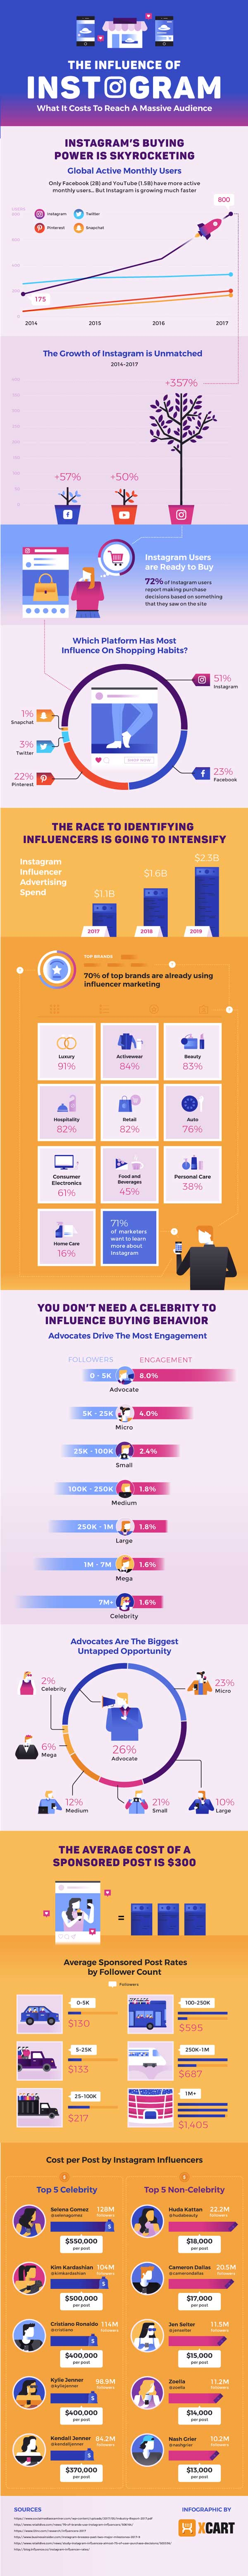 influence-instagram-infographic.jpg